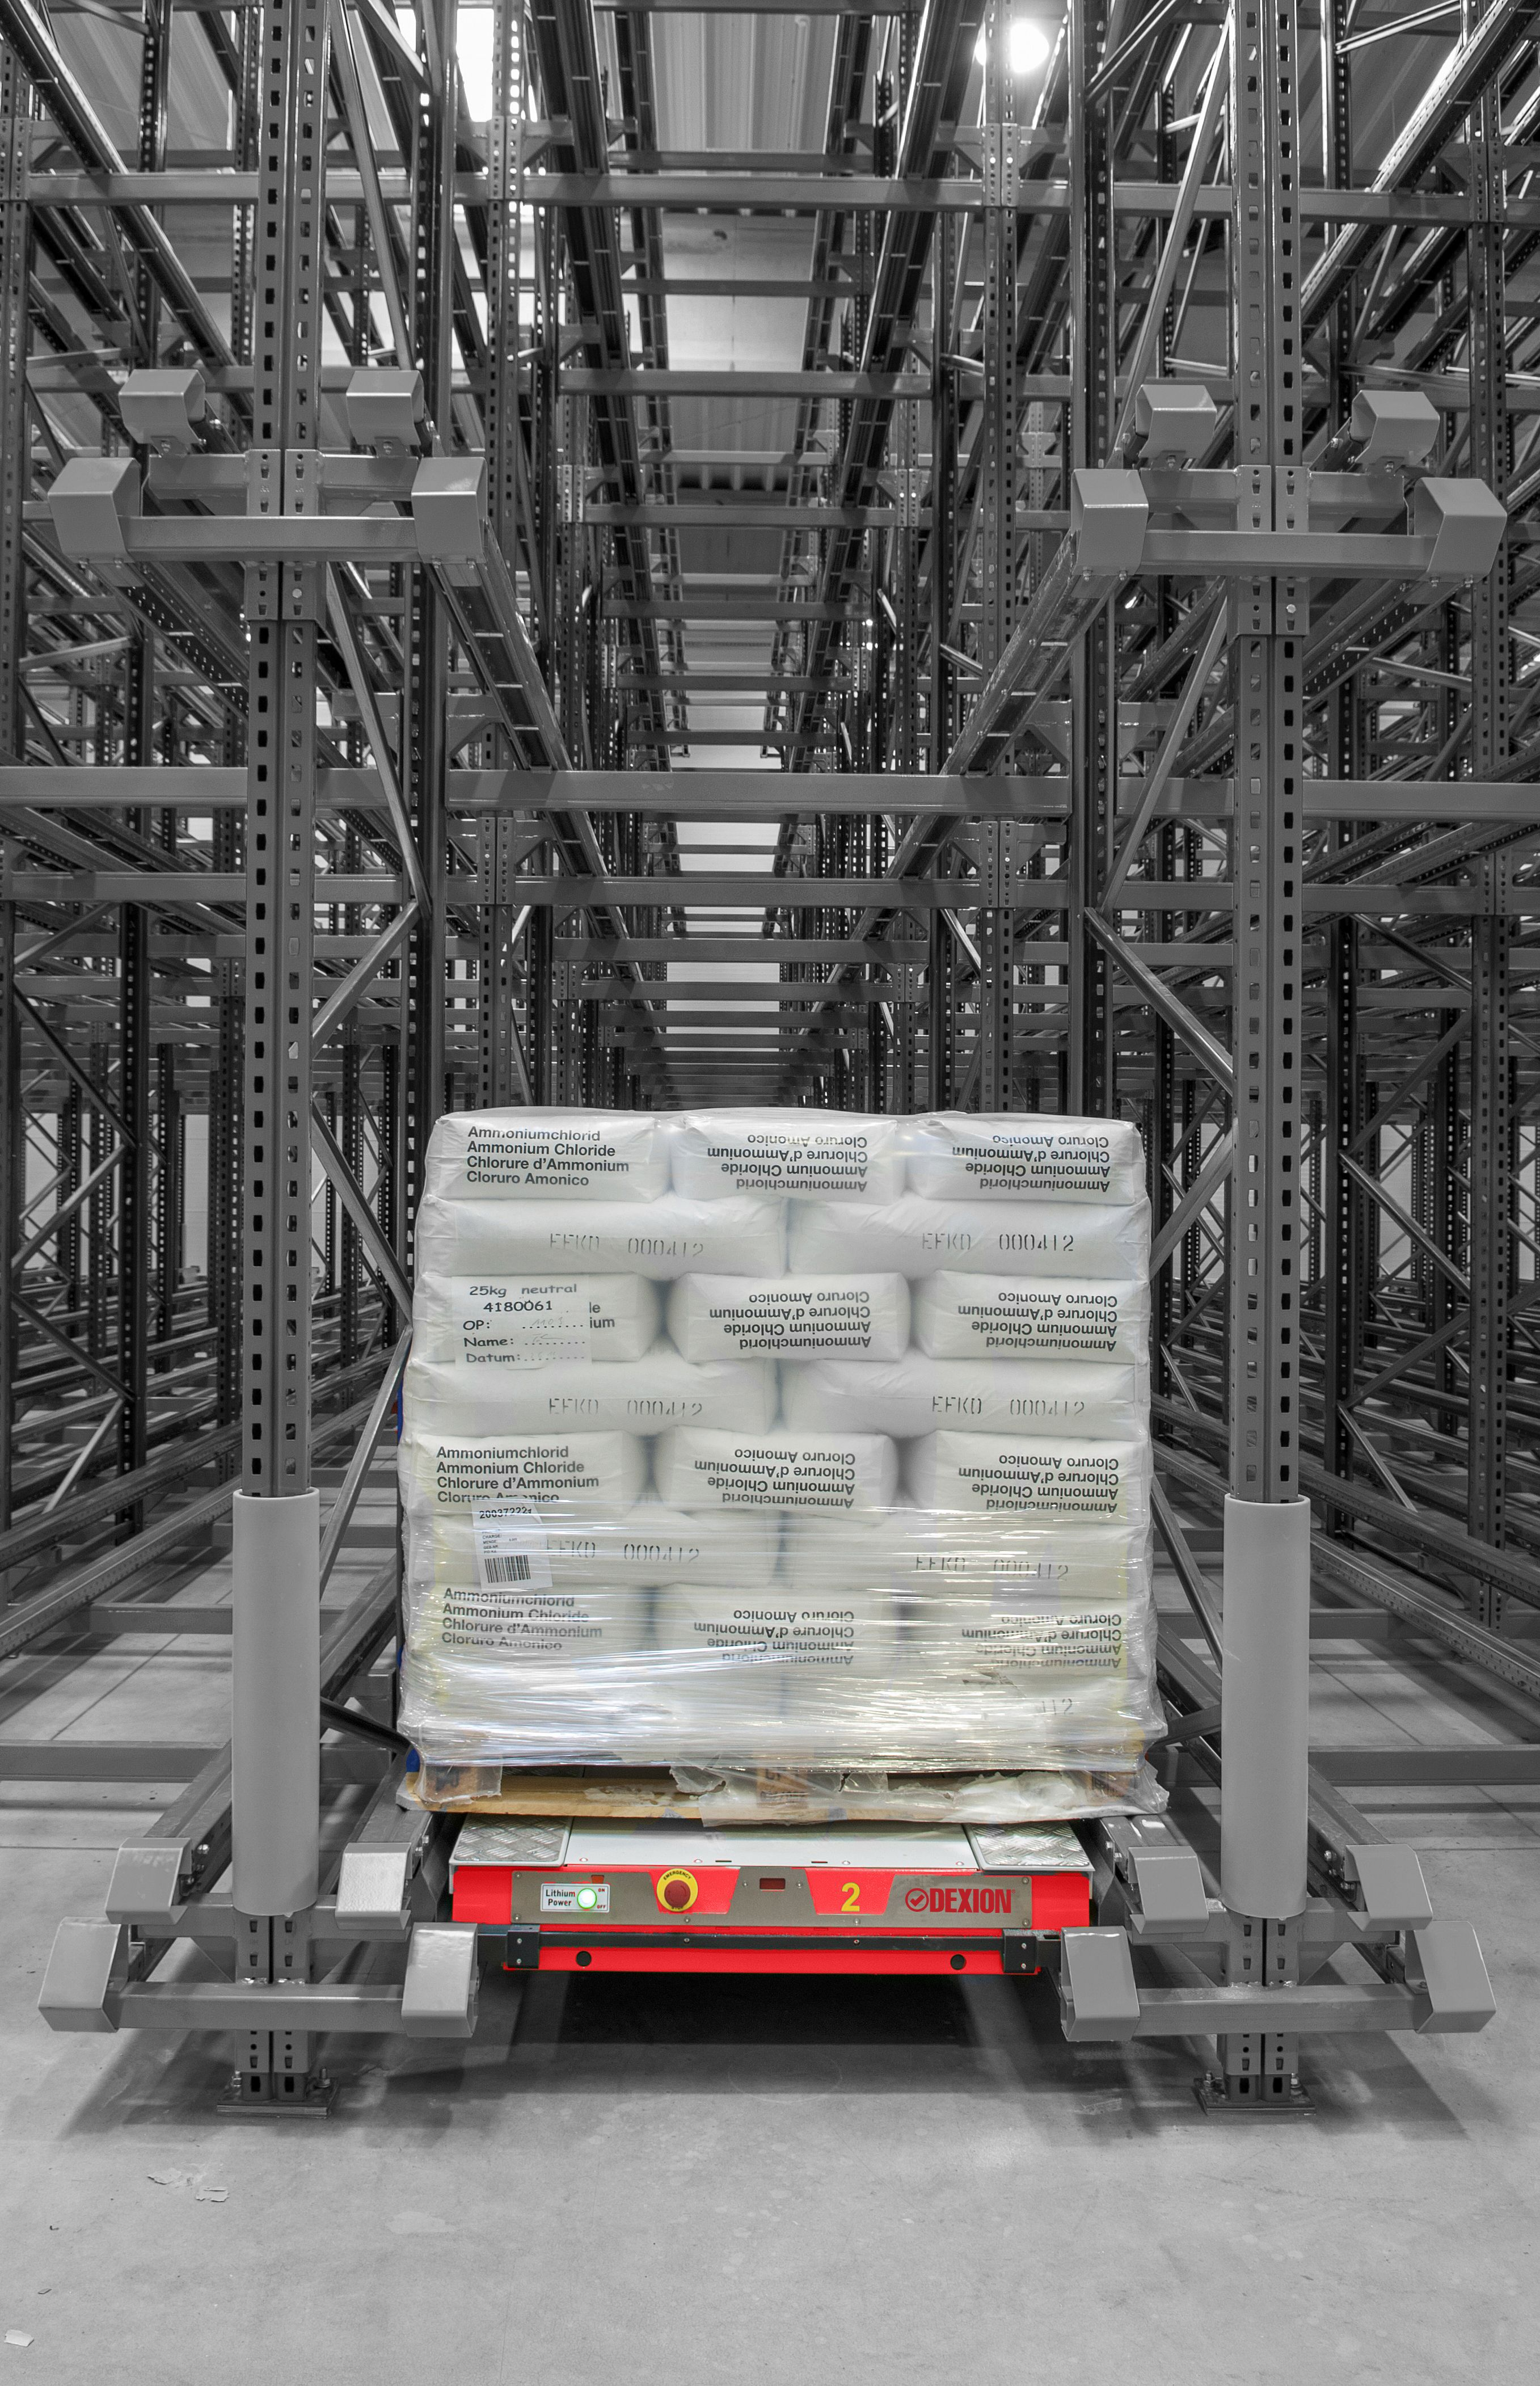 Dexion S High Density Pallet Storage System With A Shuttle Bier Brouwerij